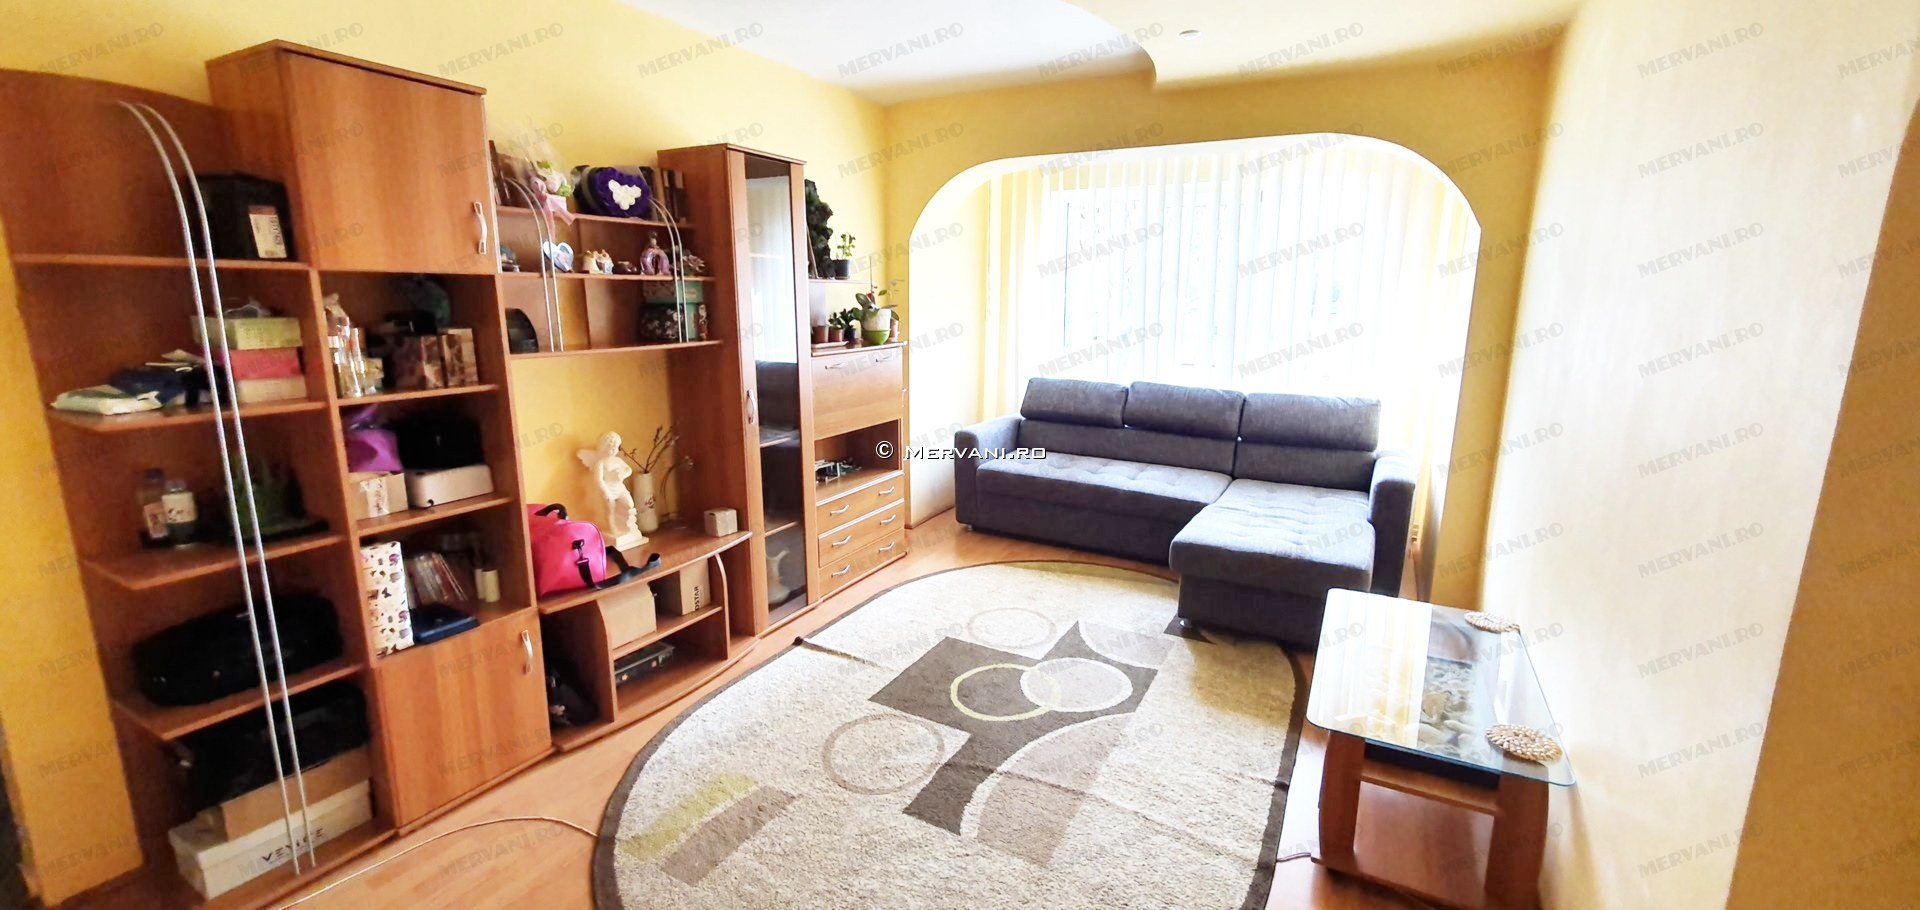 X0631 – Apartament cu 2 camere de Vanzare in Breaza, zona Liceul Militar